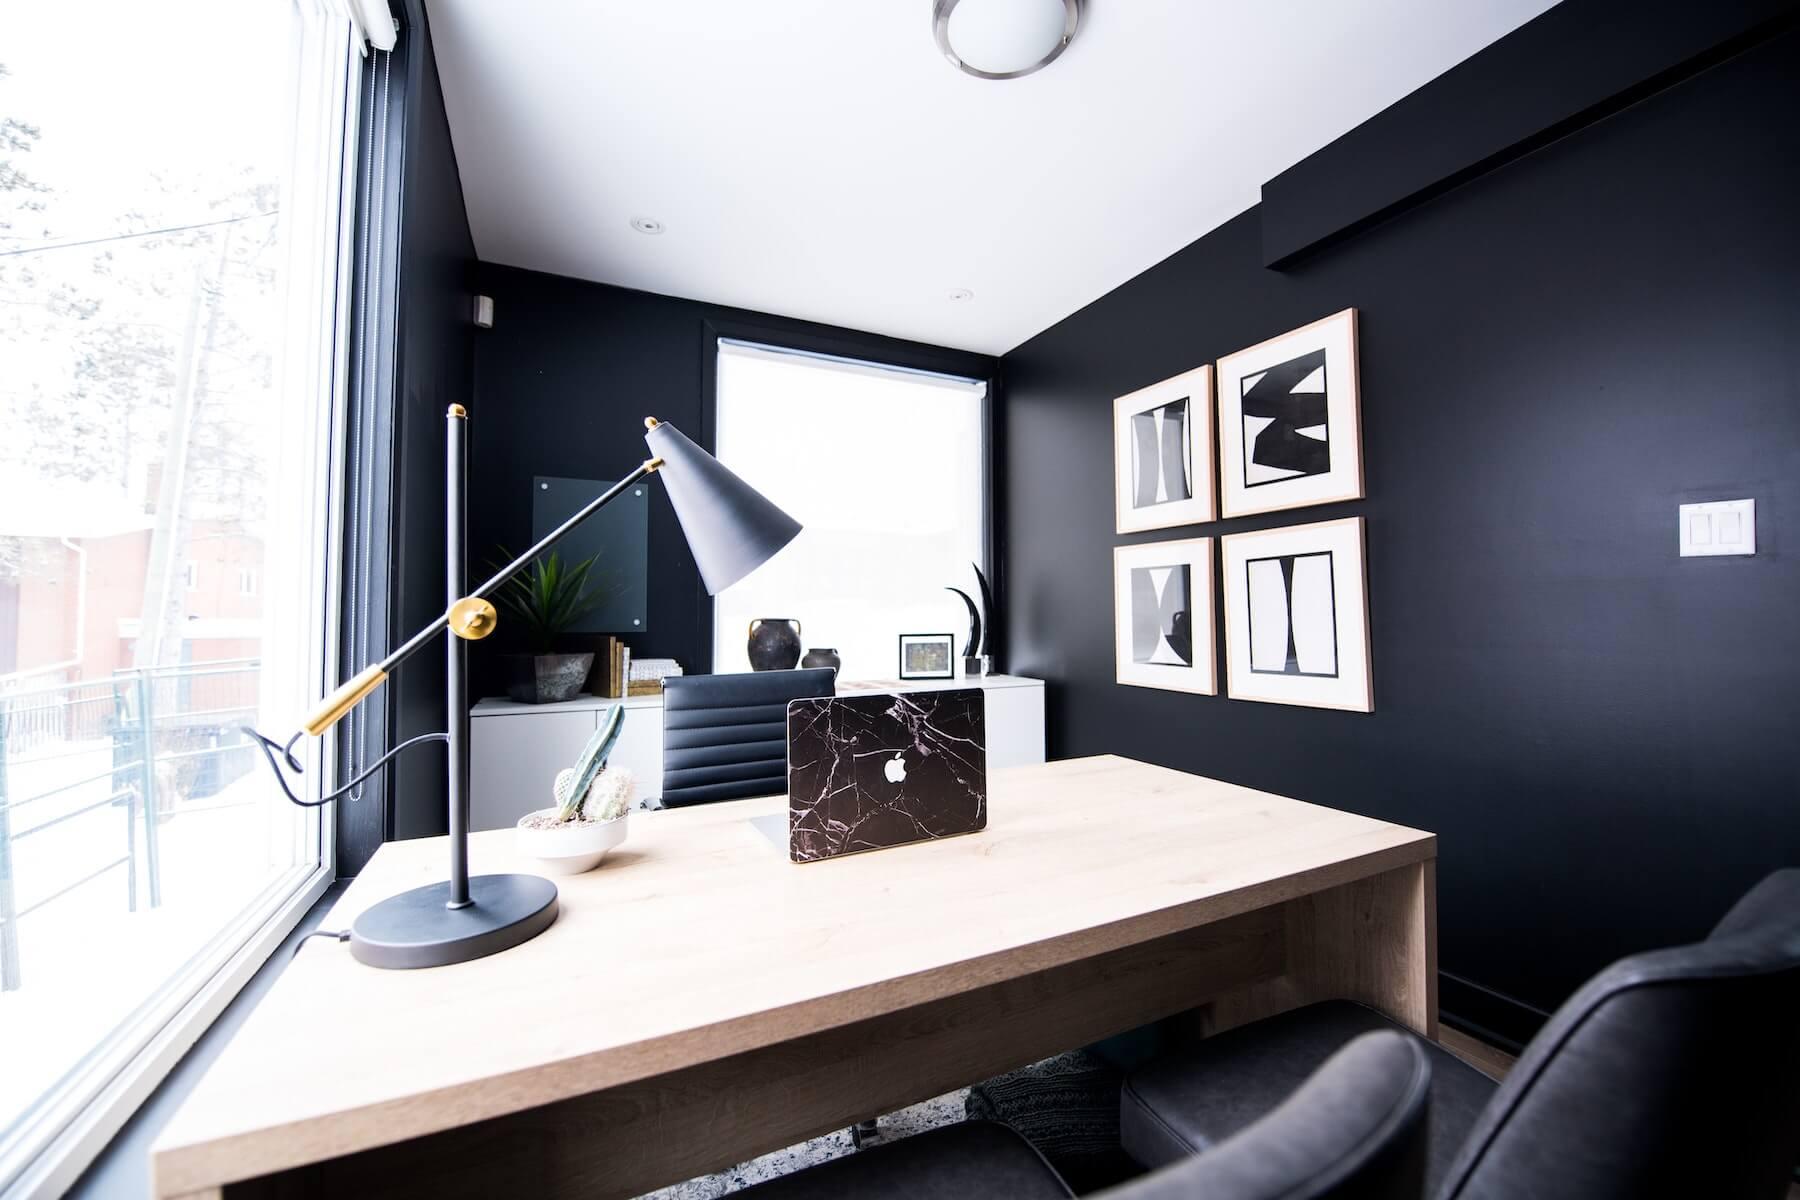 Leeg kantoor met macbook